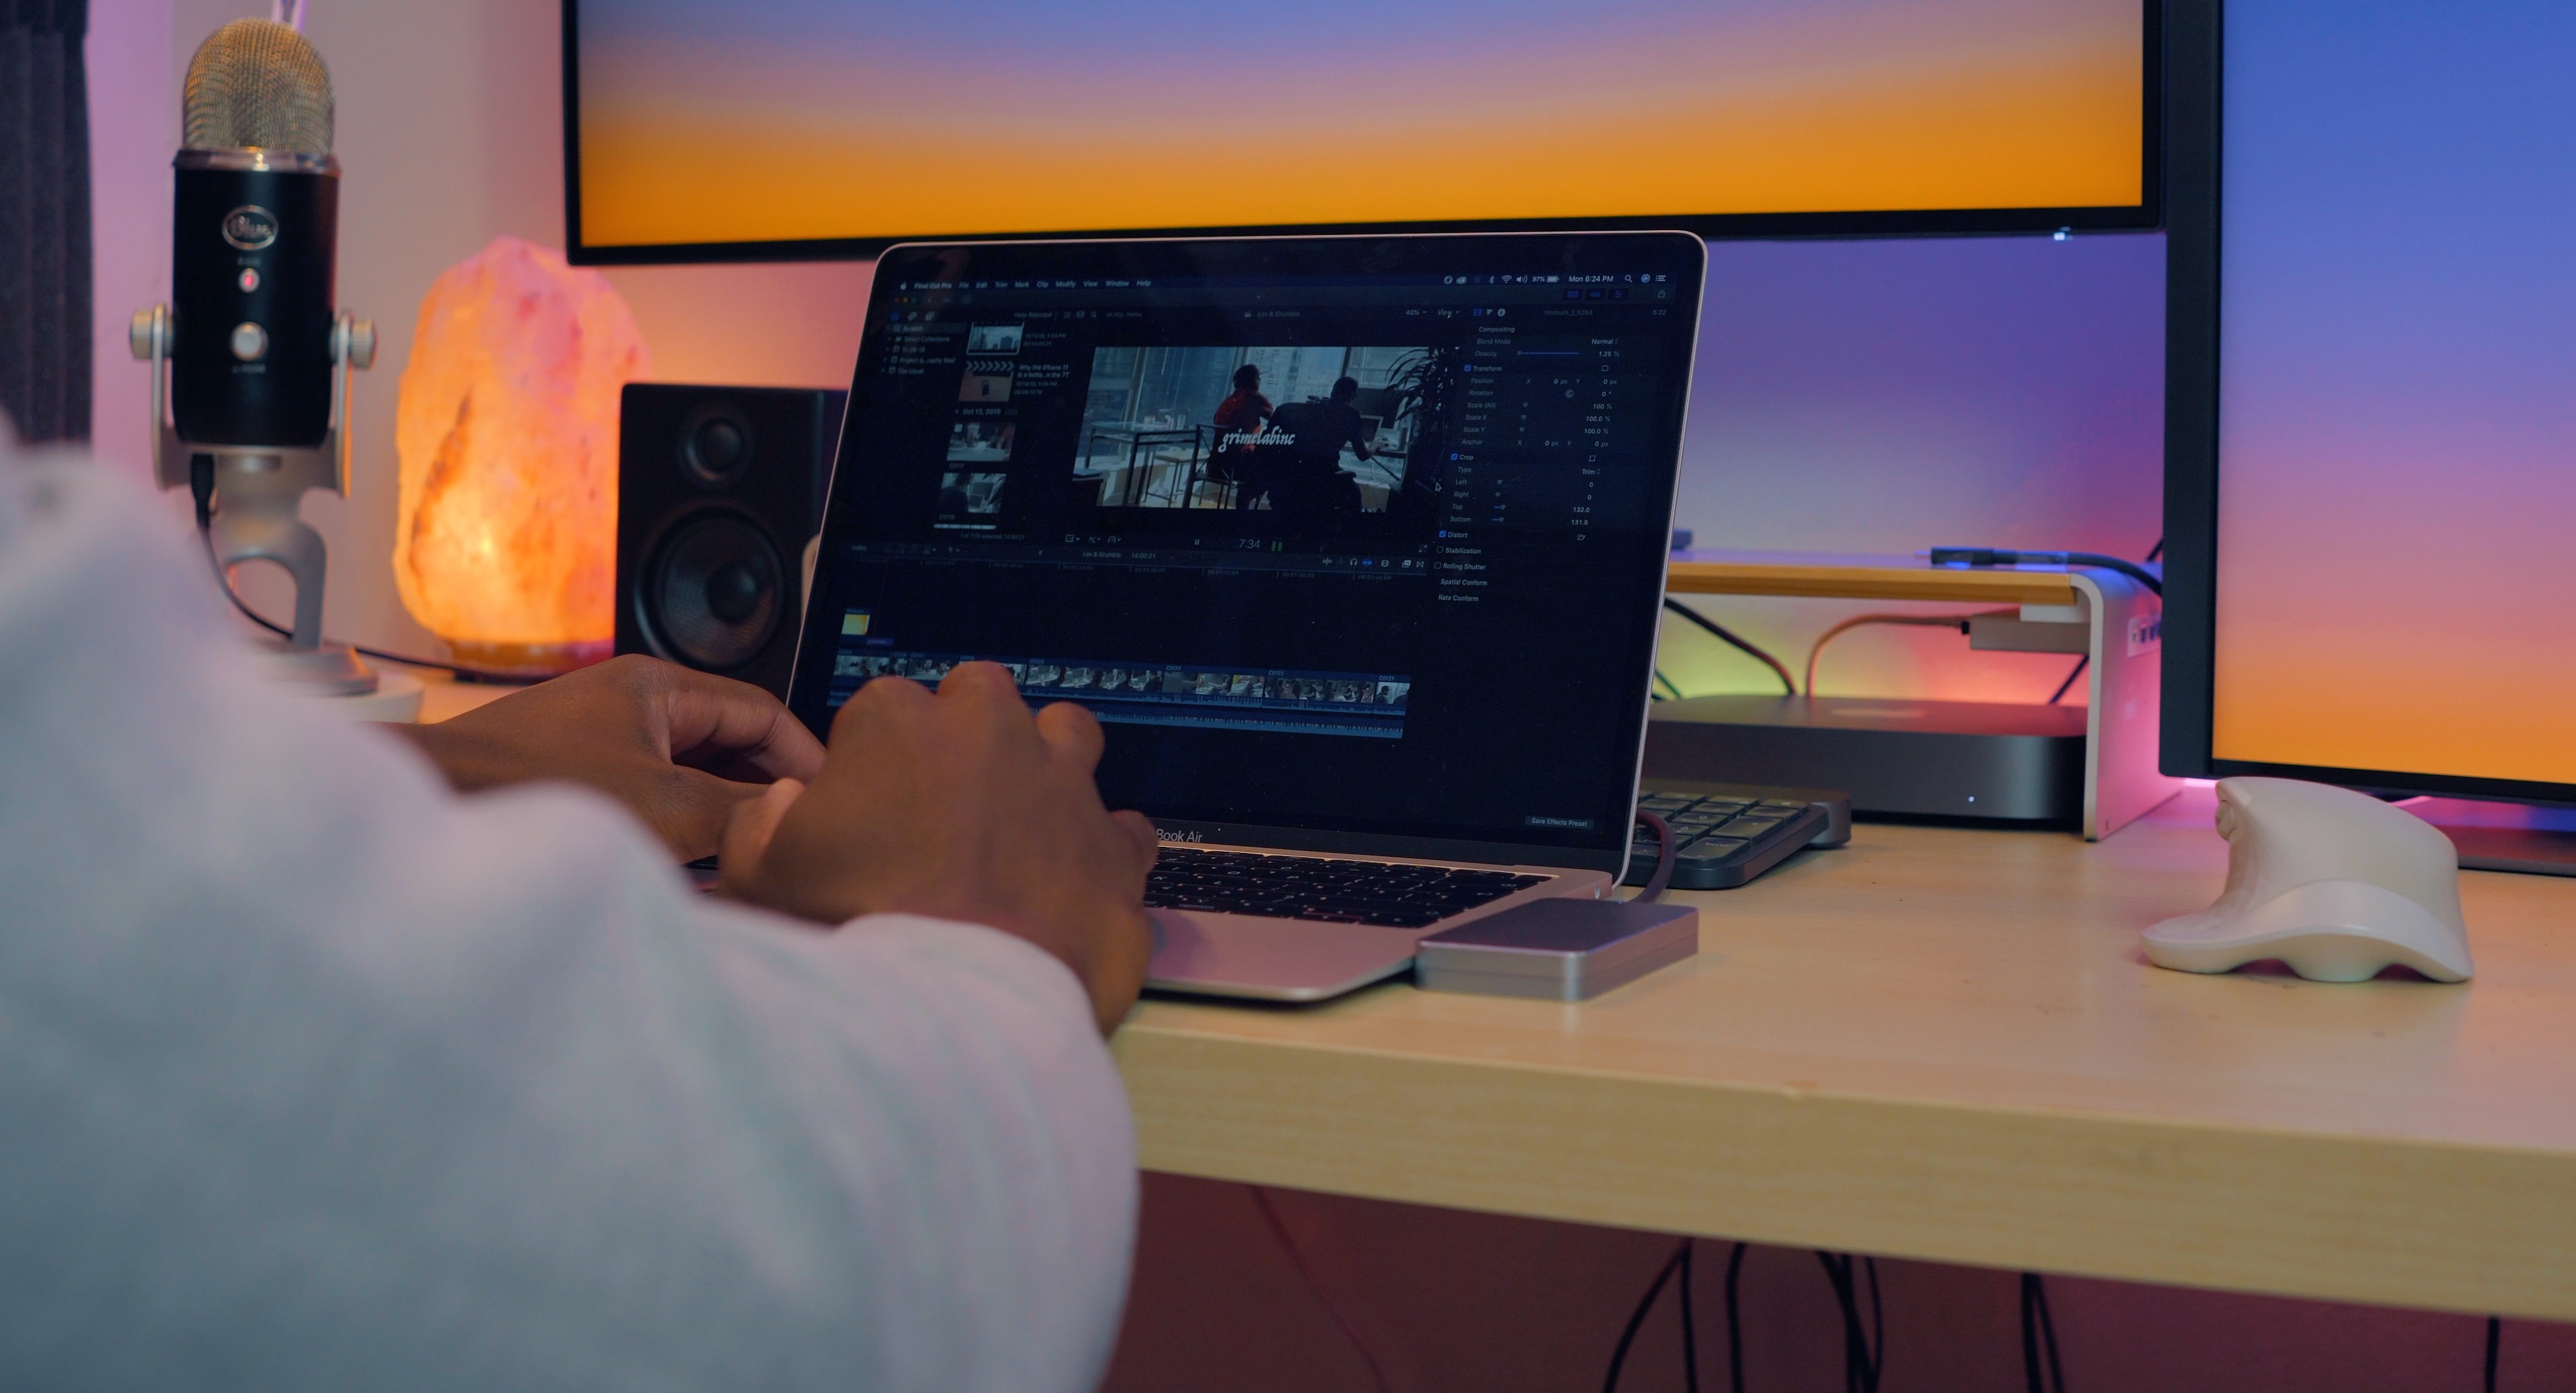 MacBook Air at a desk